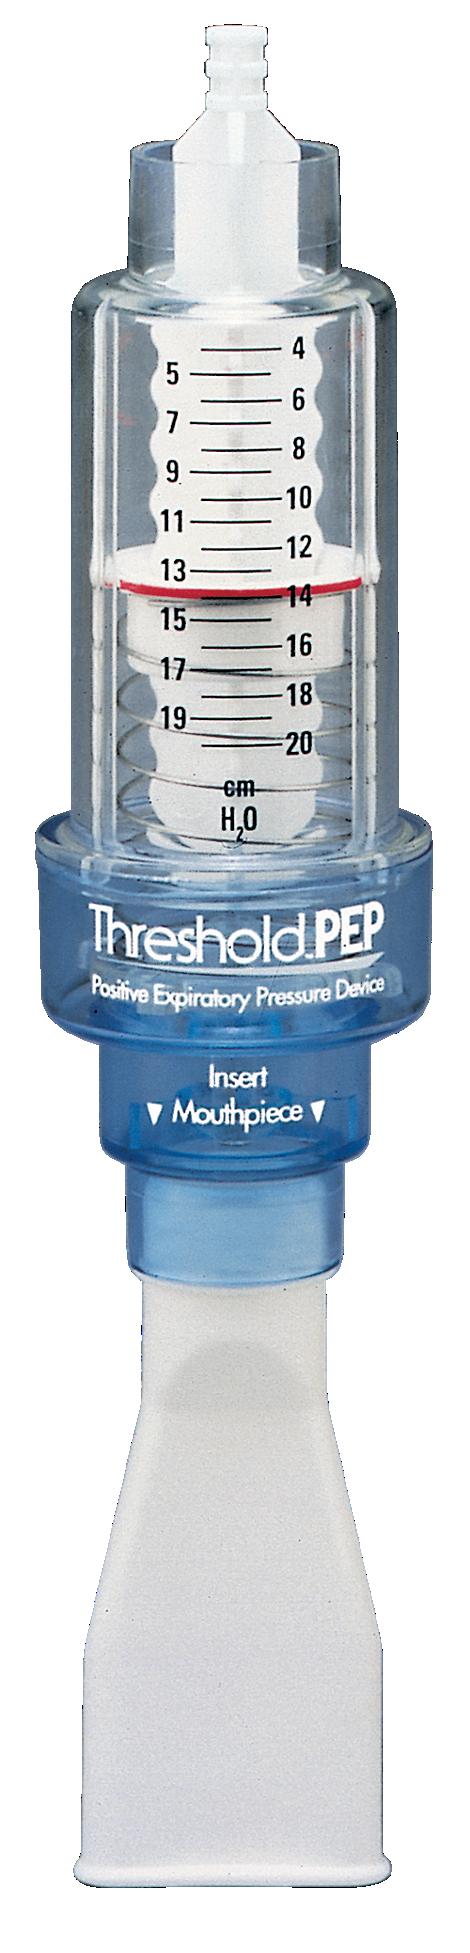 Threshold Positive expiratory pressure device